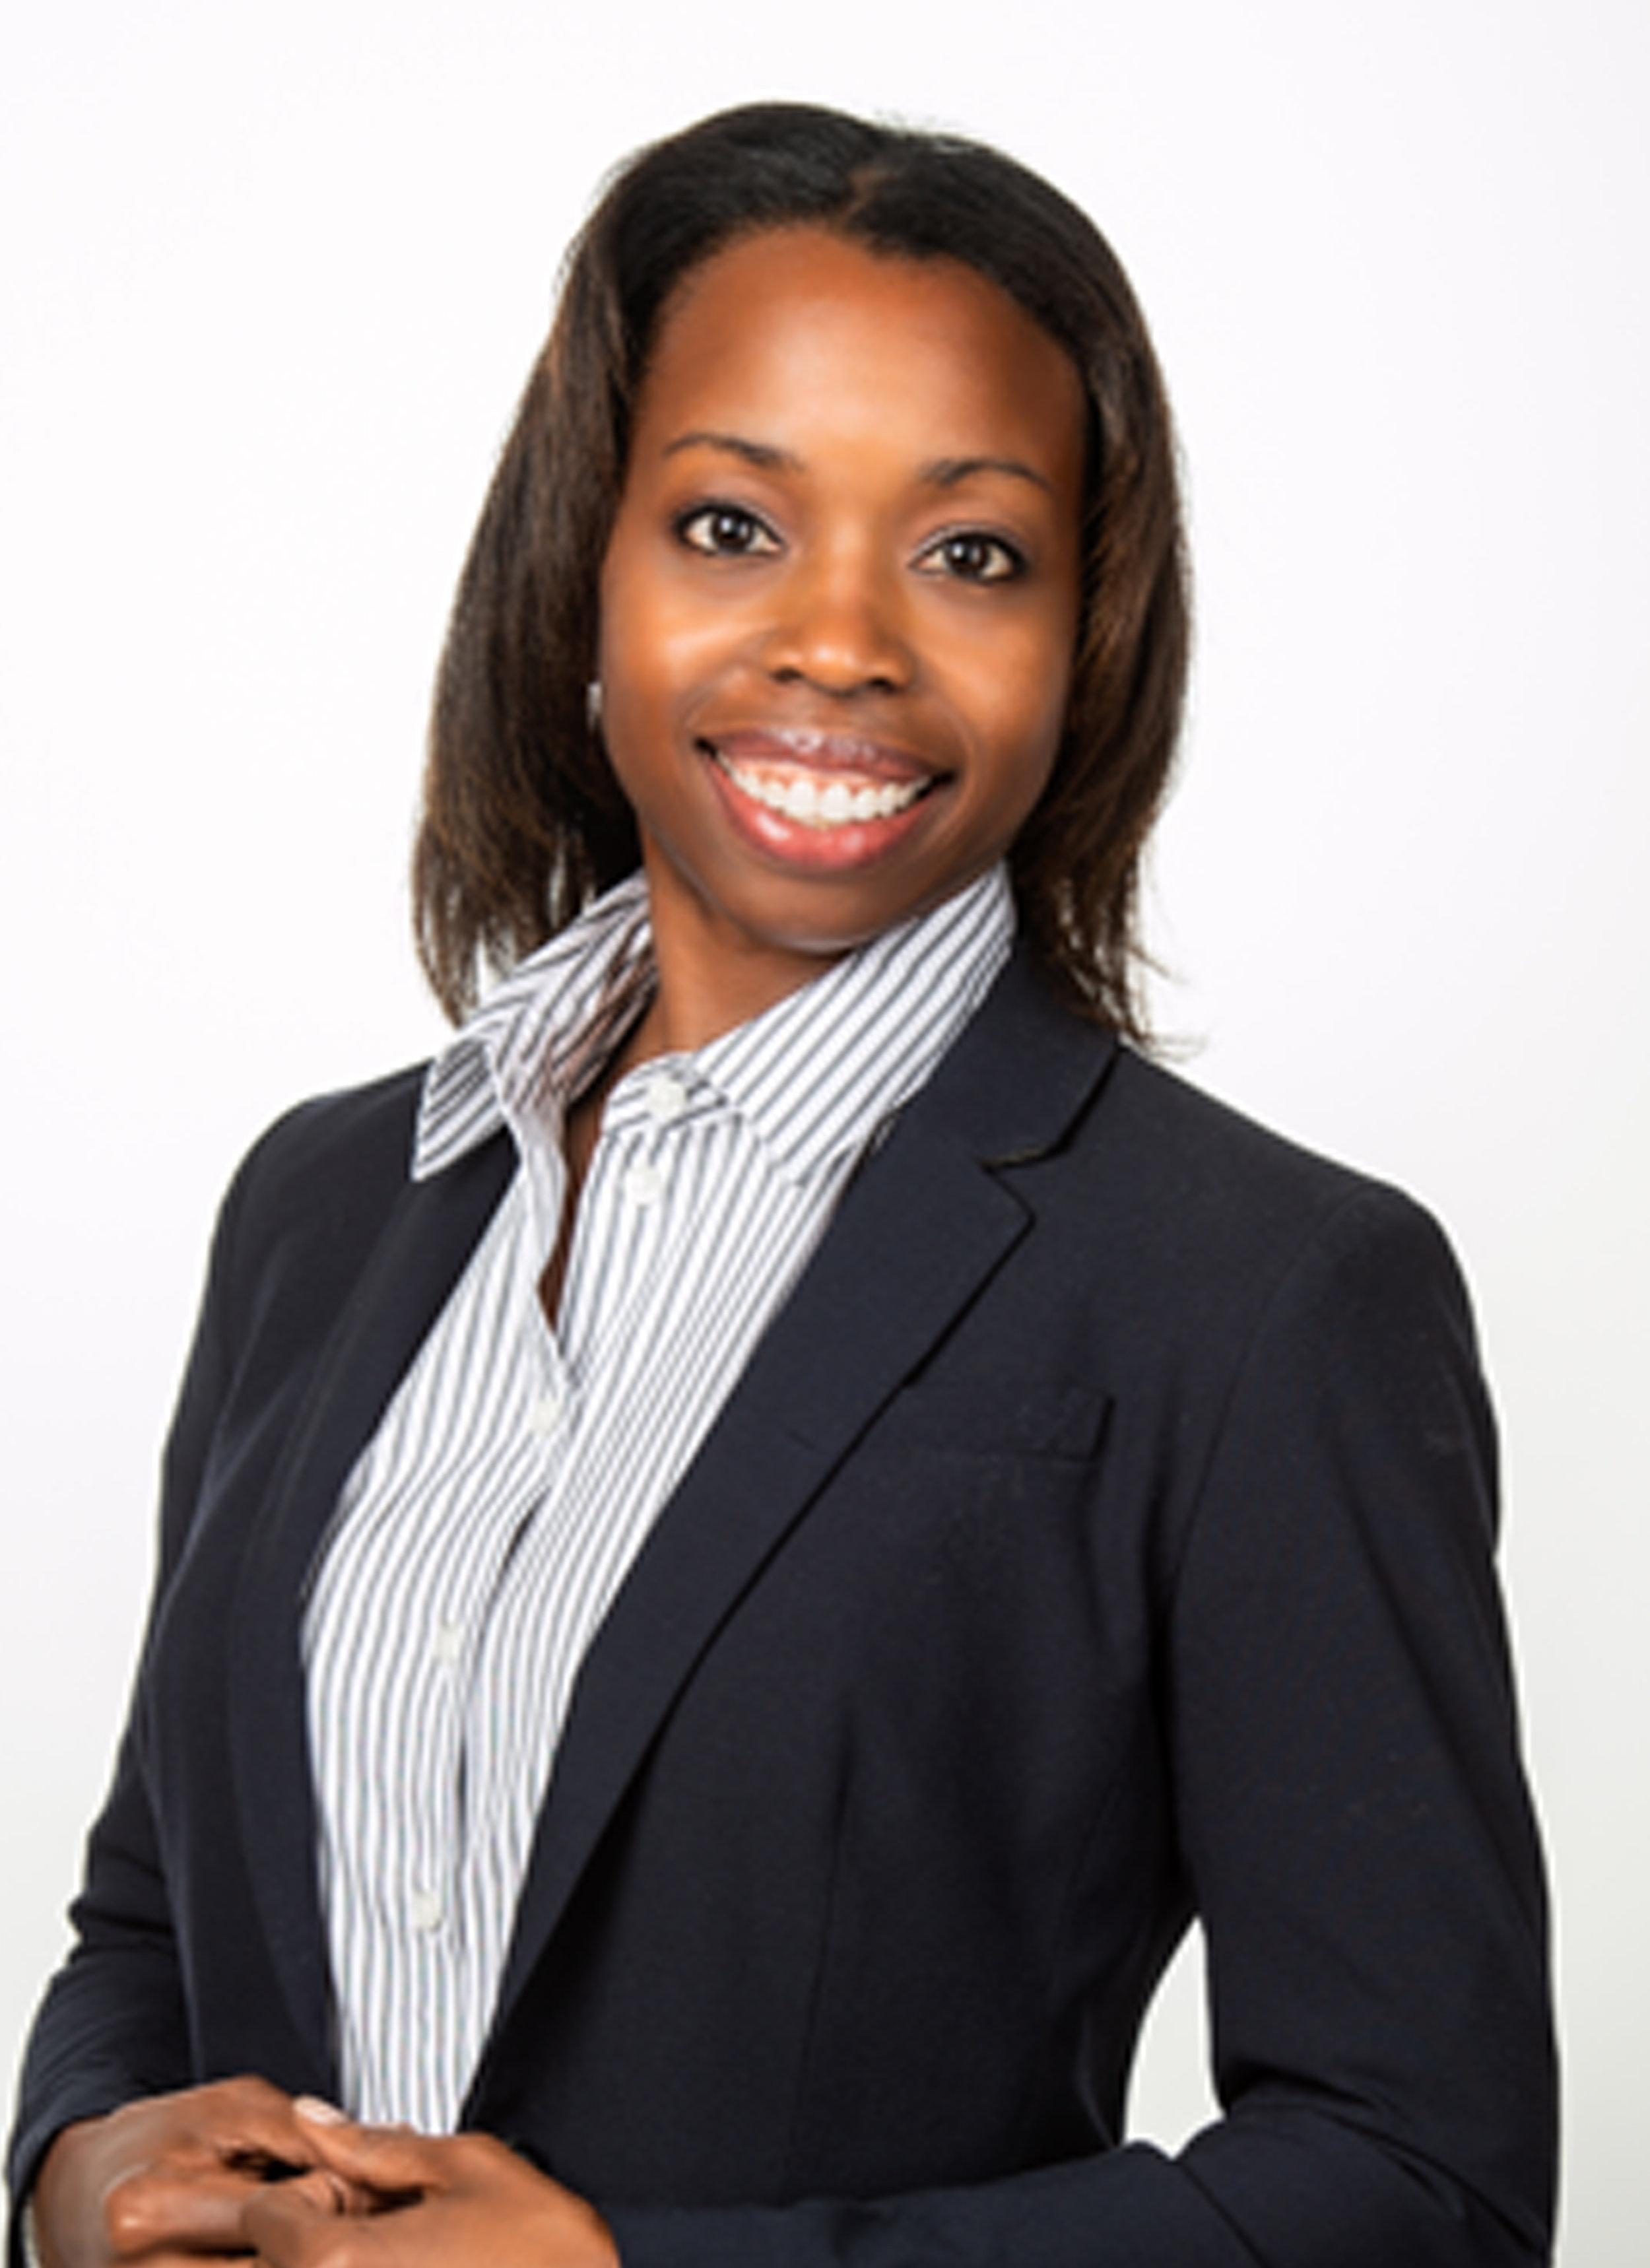 Kesia Sondrini - Director, Advisor Relationship Management